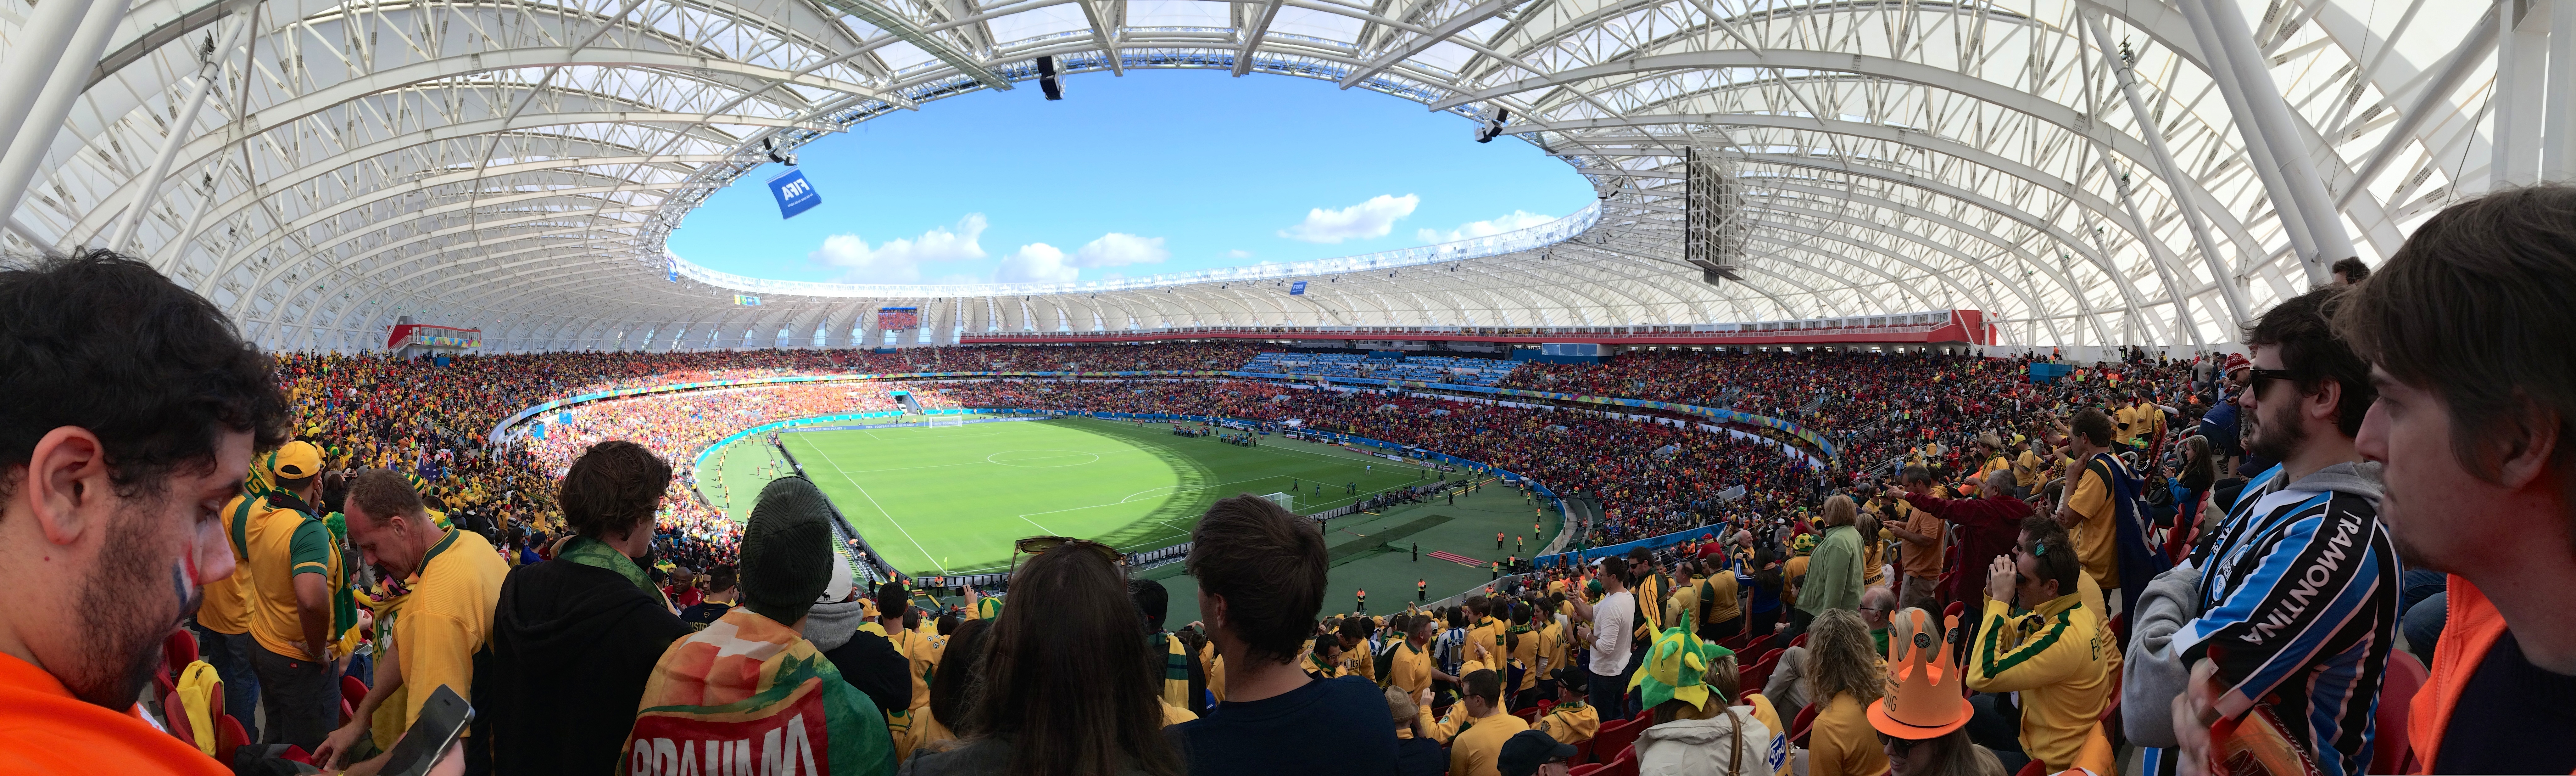 Brazil-Degen-Hill-world-cup-soccer-brazil